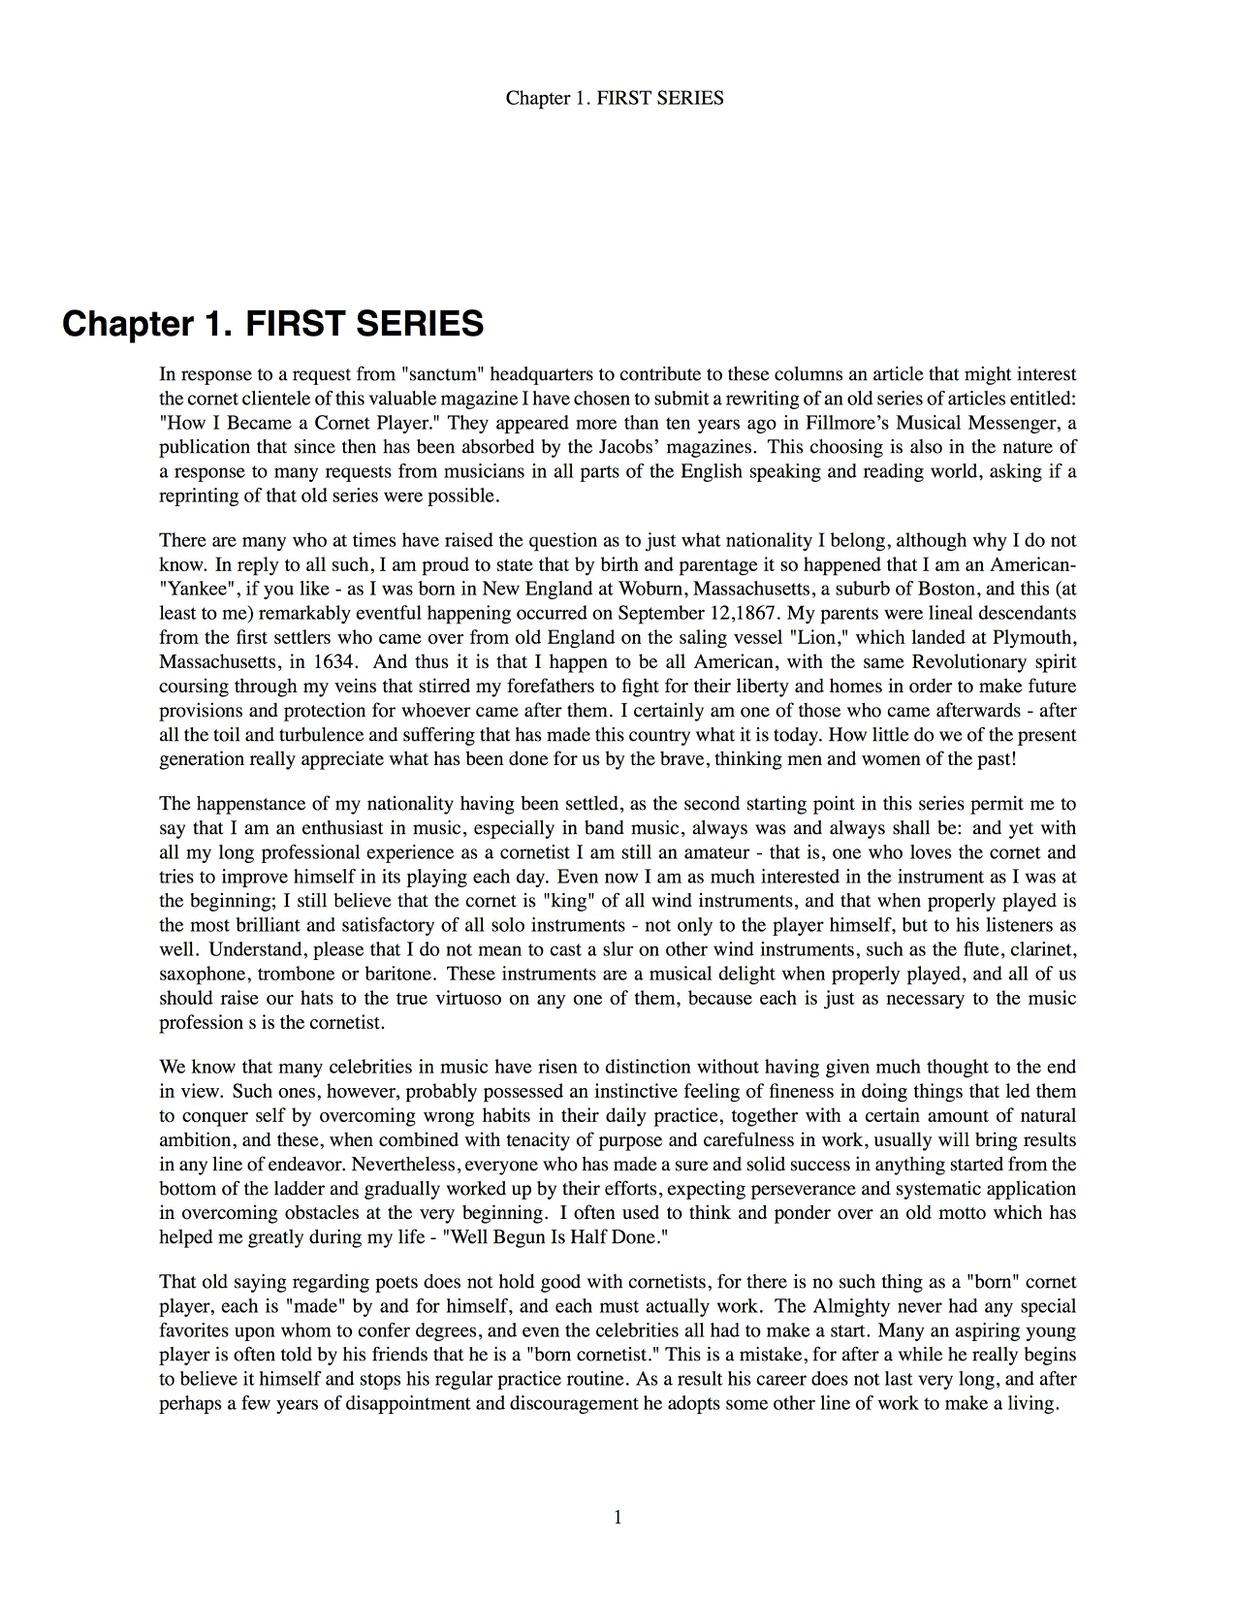 Clarke, How I Became a Cornetist bigger-p07